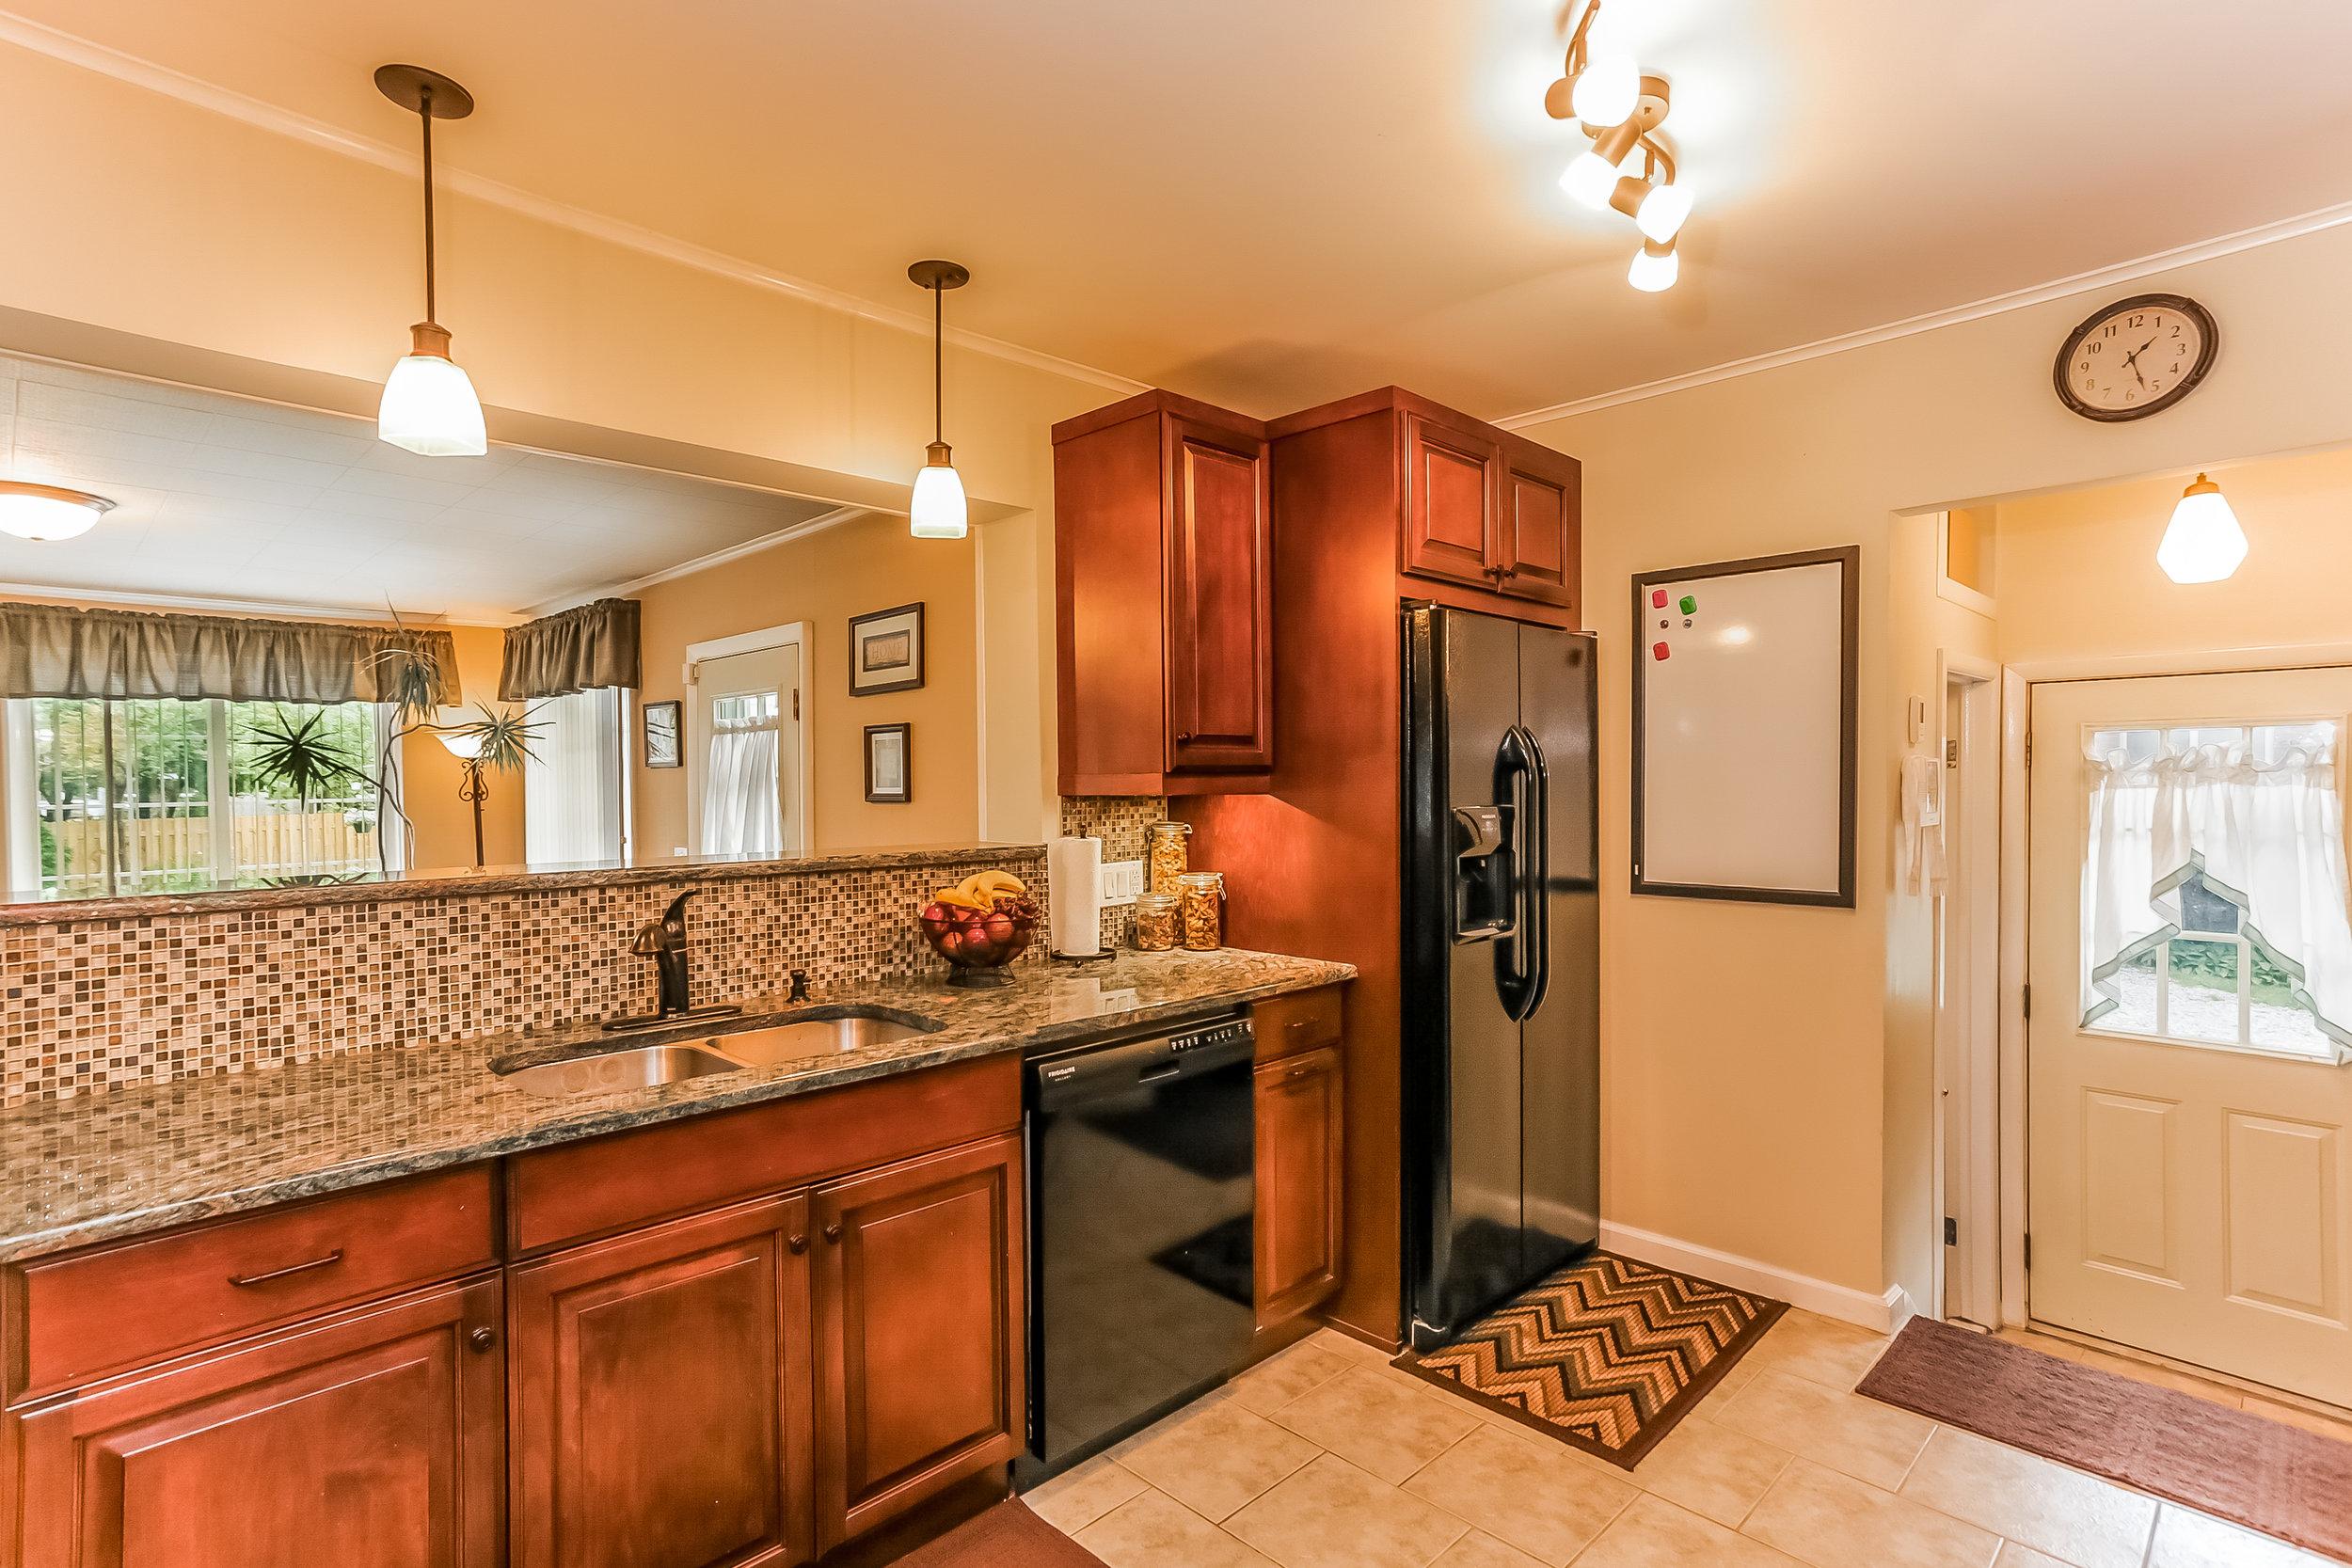 fleetwood kitchen.jpg